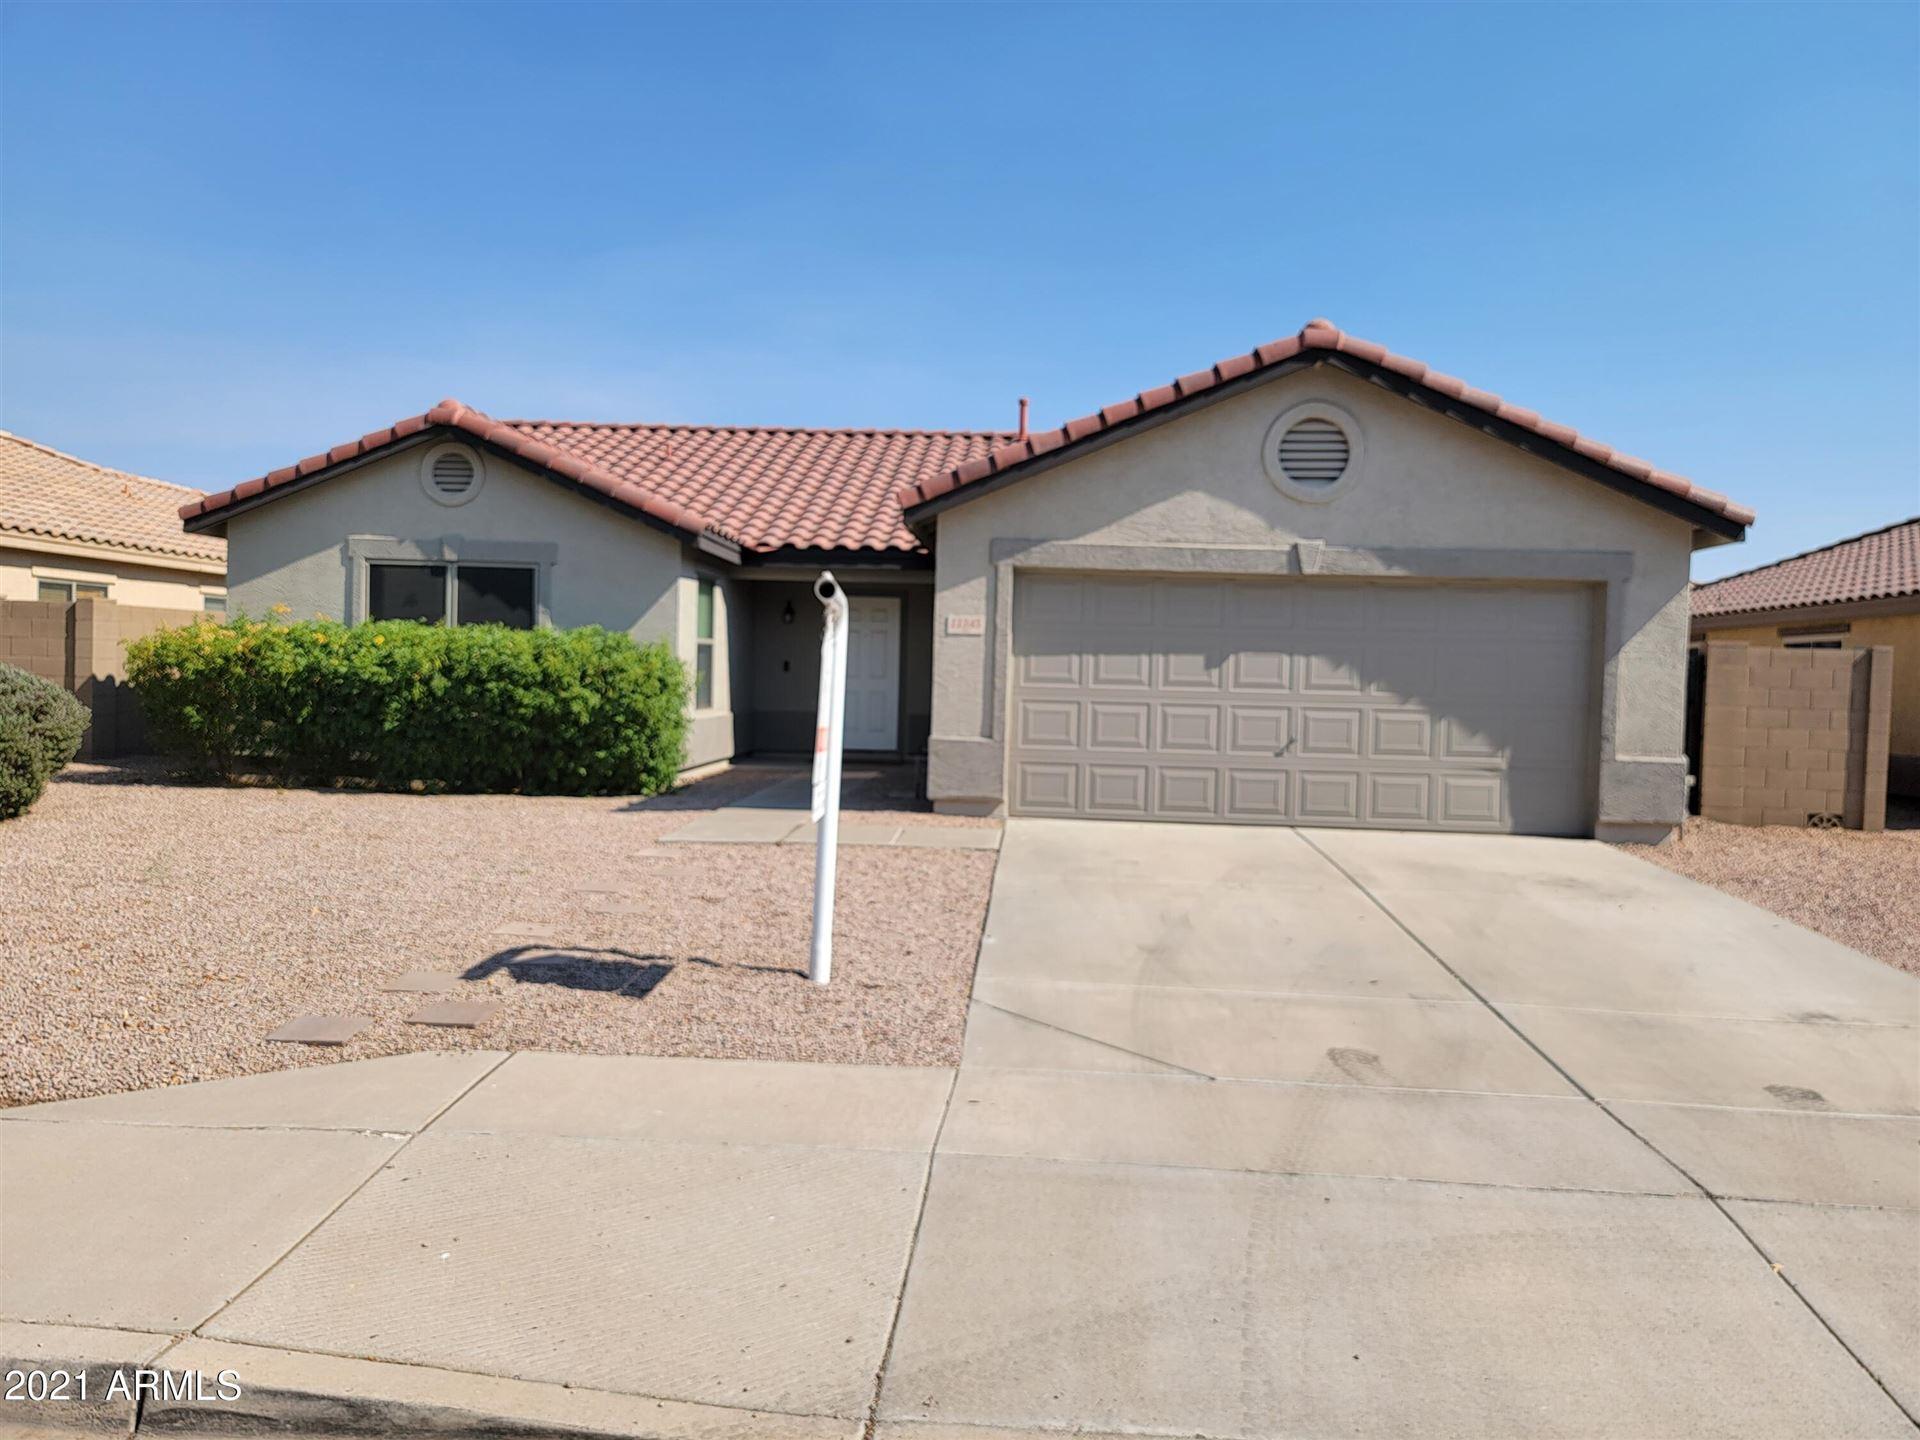 11345 E RAMBLEWOOD Avenue #3, Mesa, AZ 85212 - MLS#: 6253064